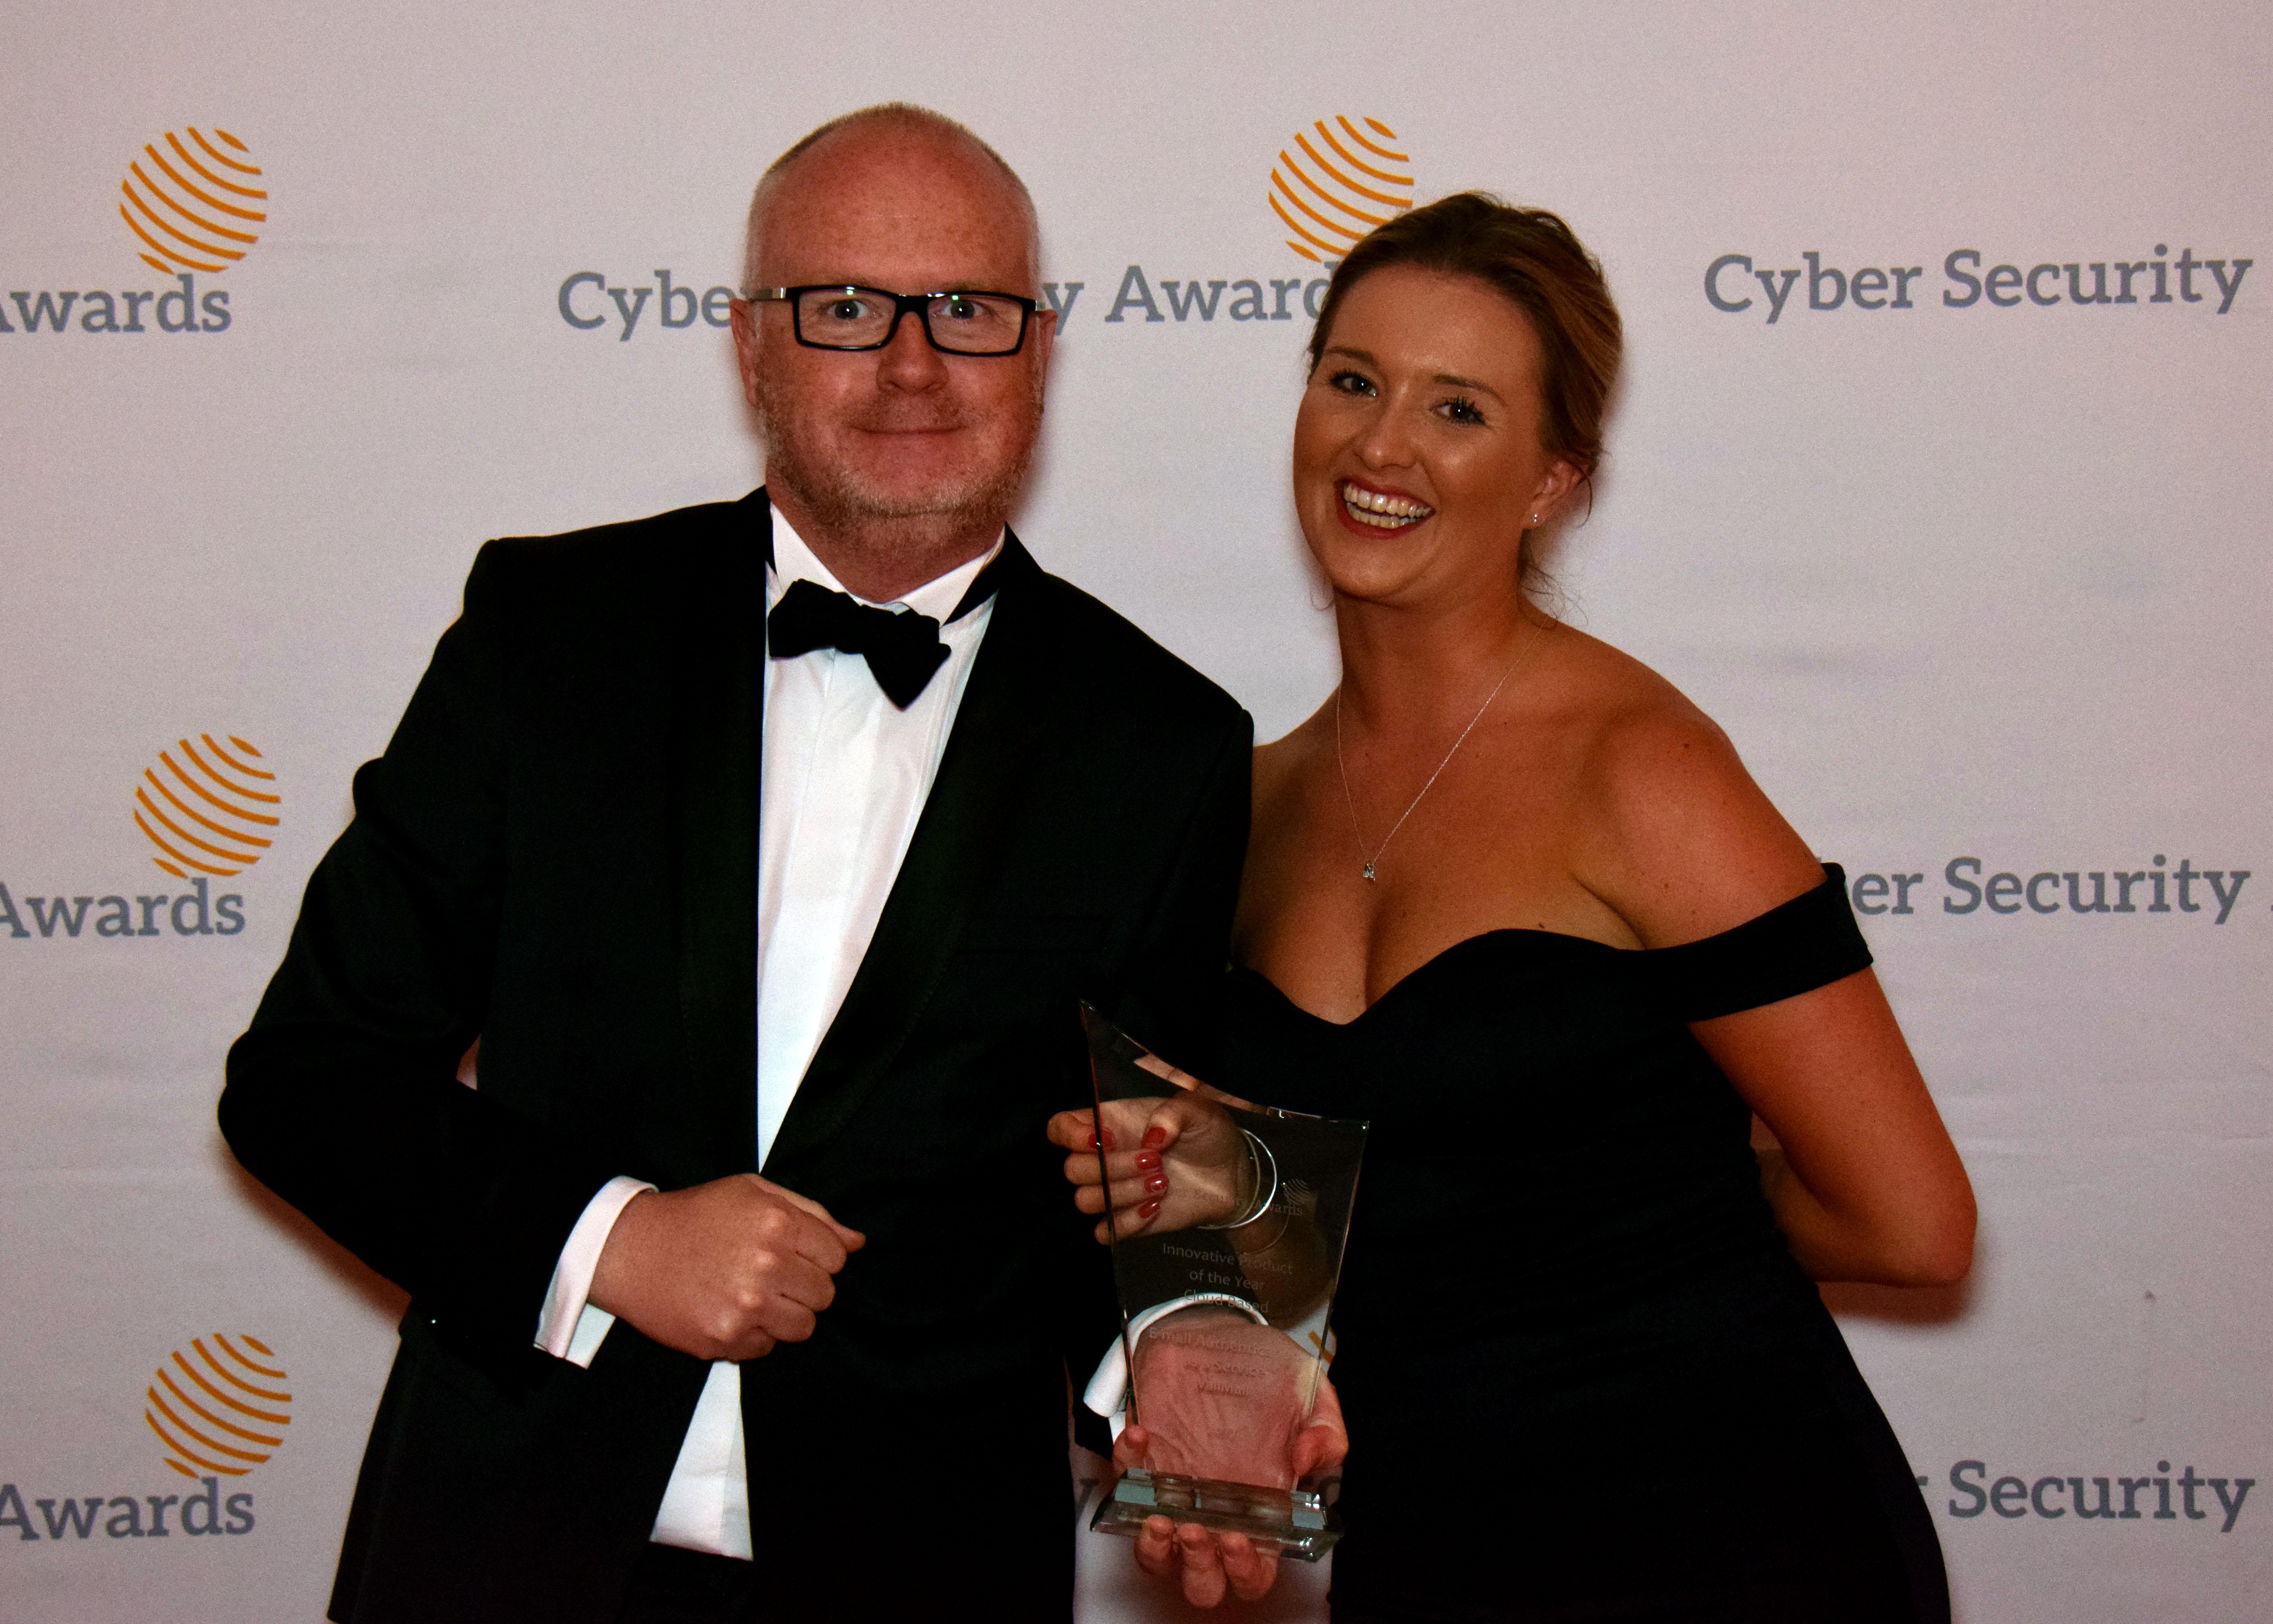 2017 Cyber Security Awards ValiMai